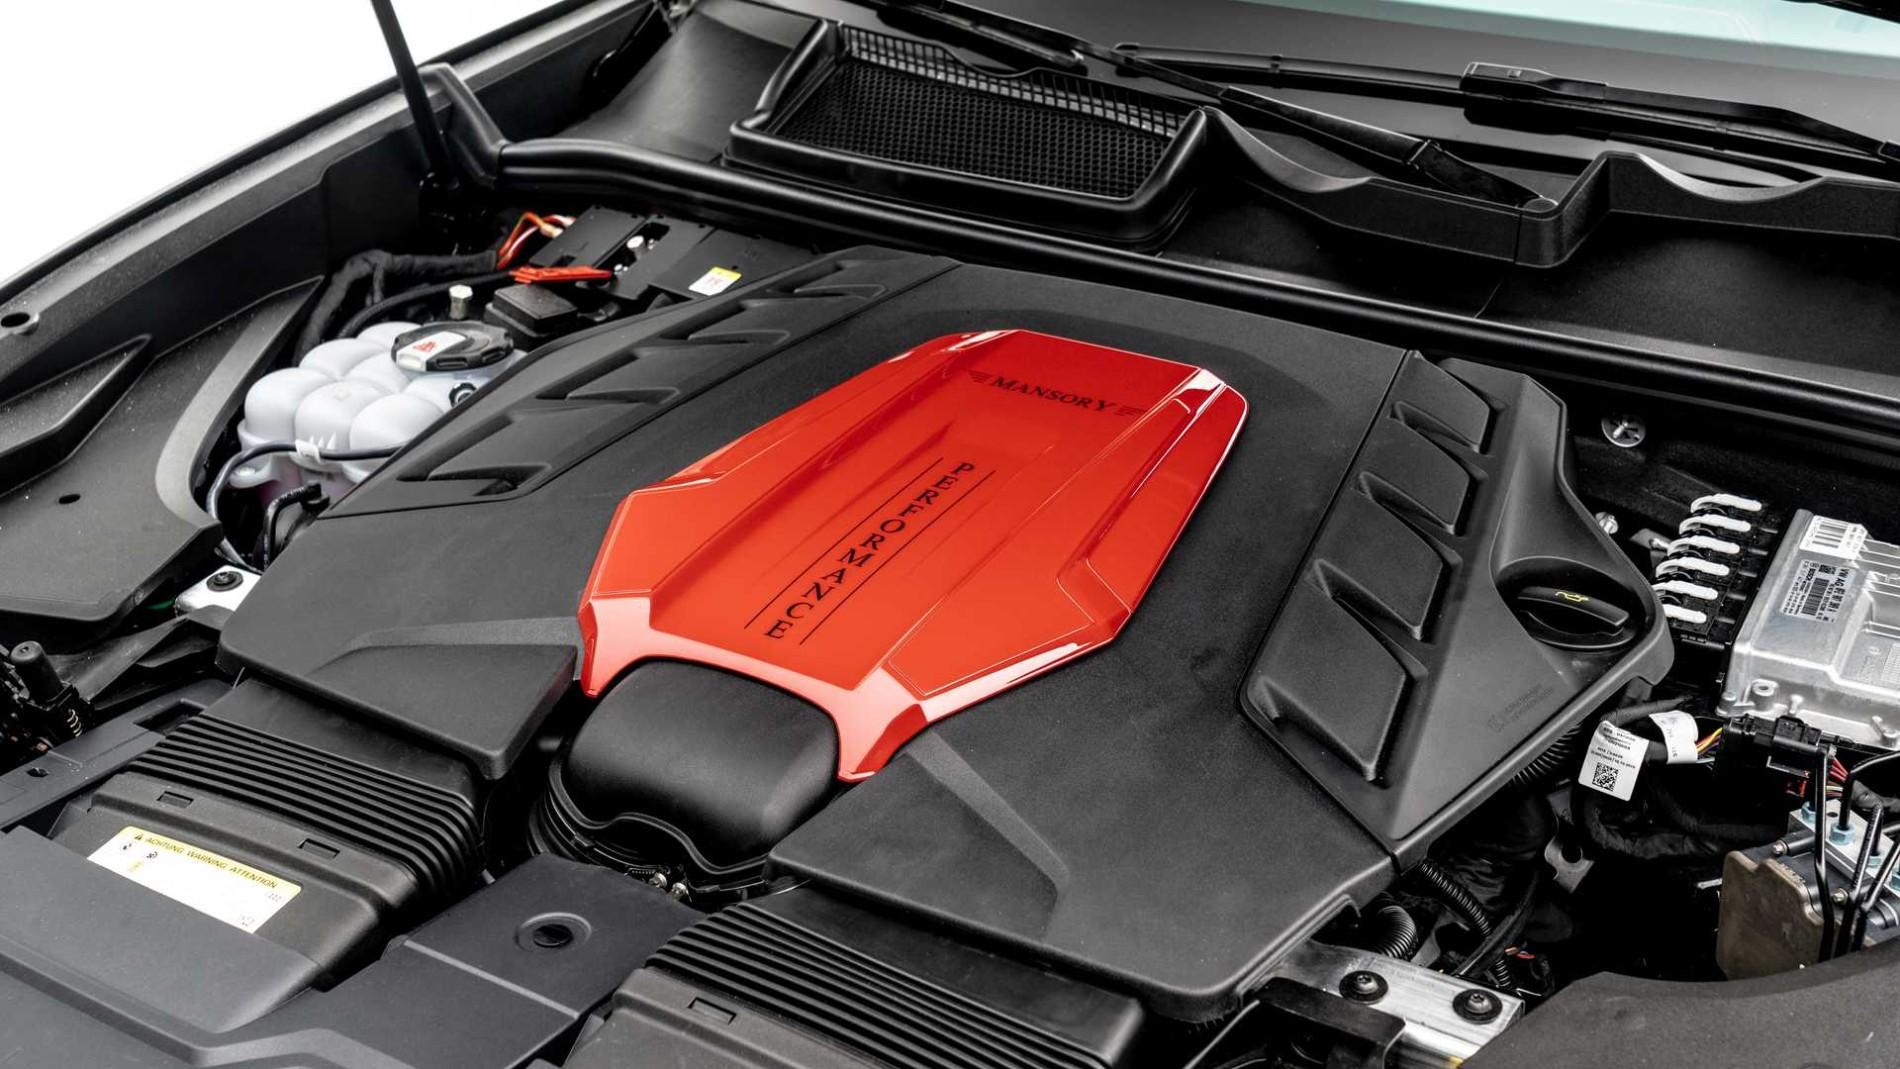 Audi RS Q8 de la Mansory - Audi RS Q8 de la Mansory